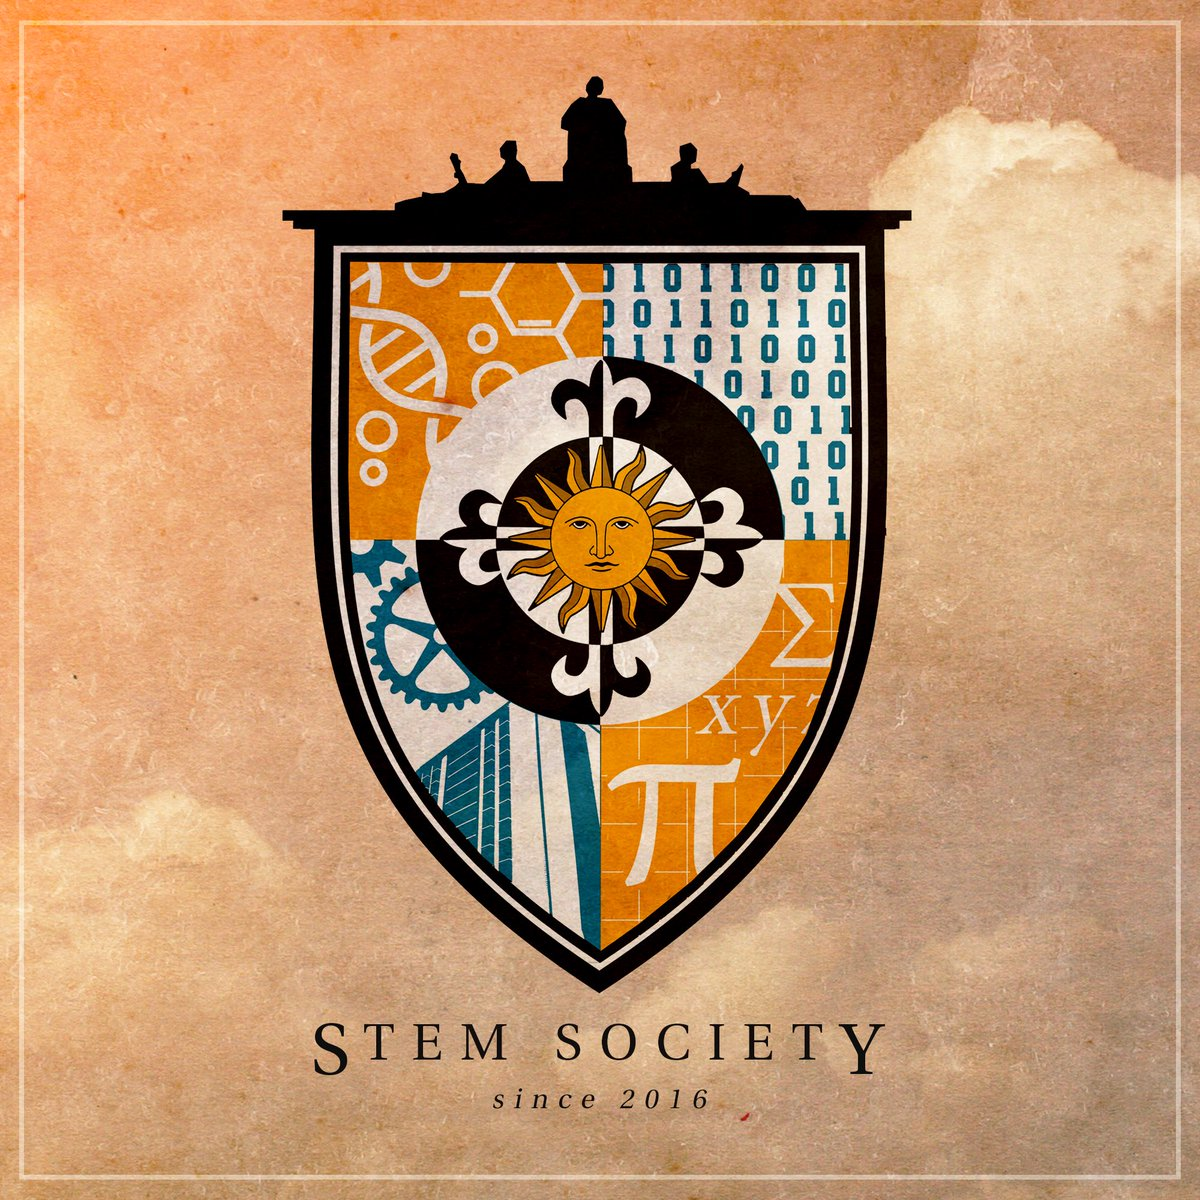 Ust Shs Stem Society On Twitter The Official Stem Society Logo